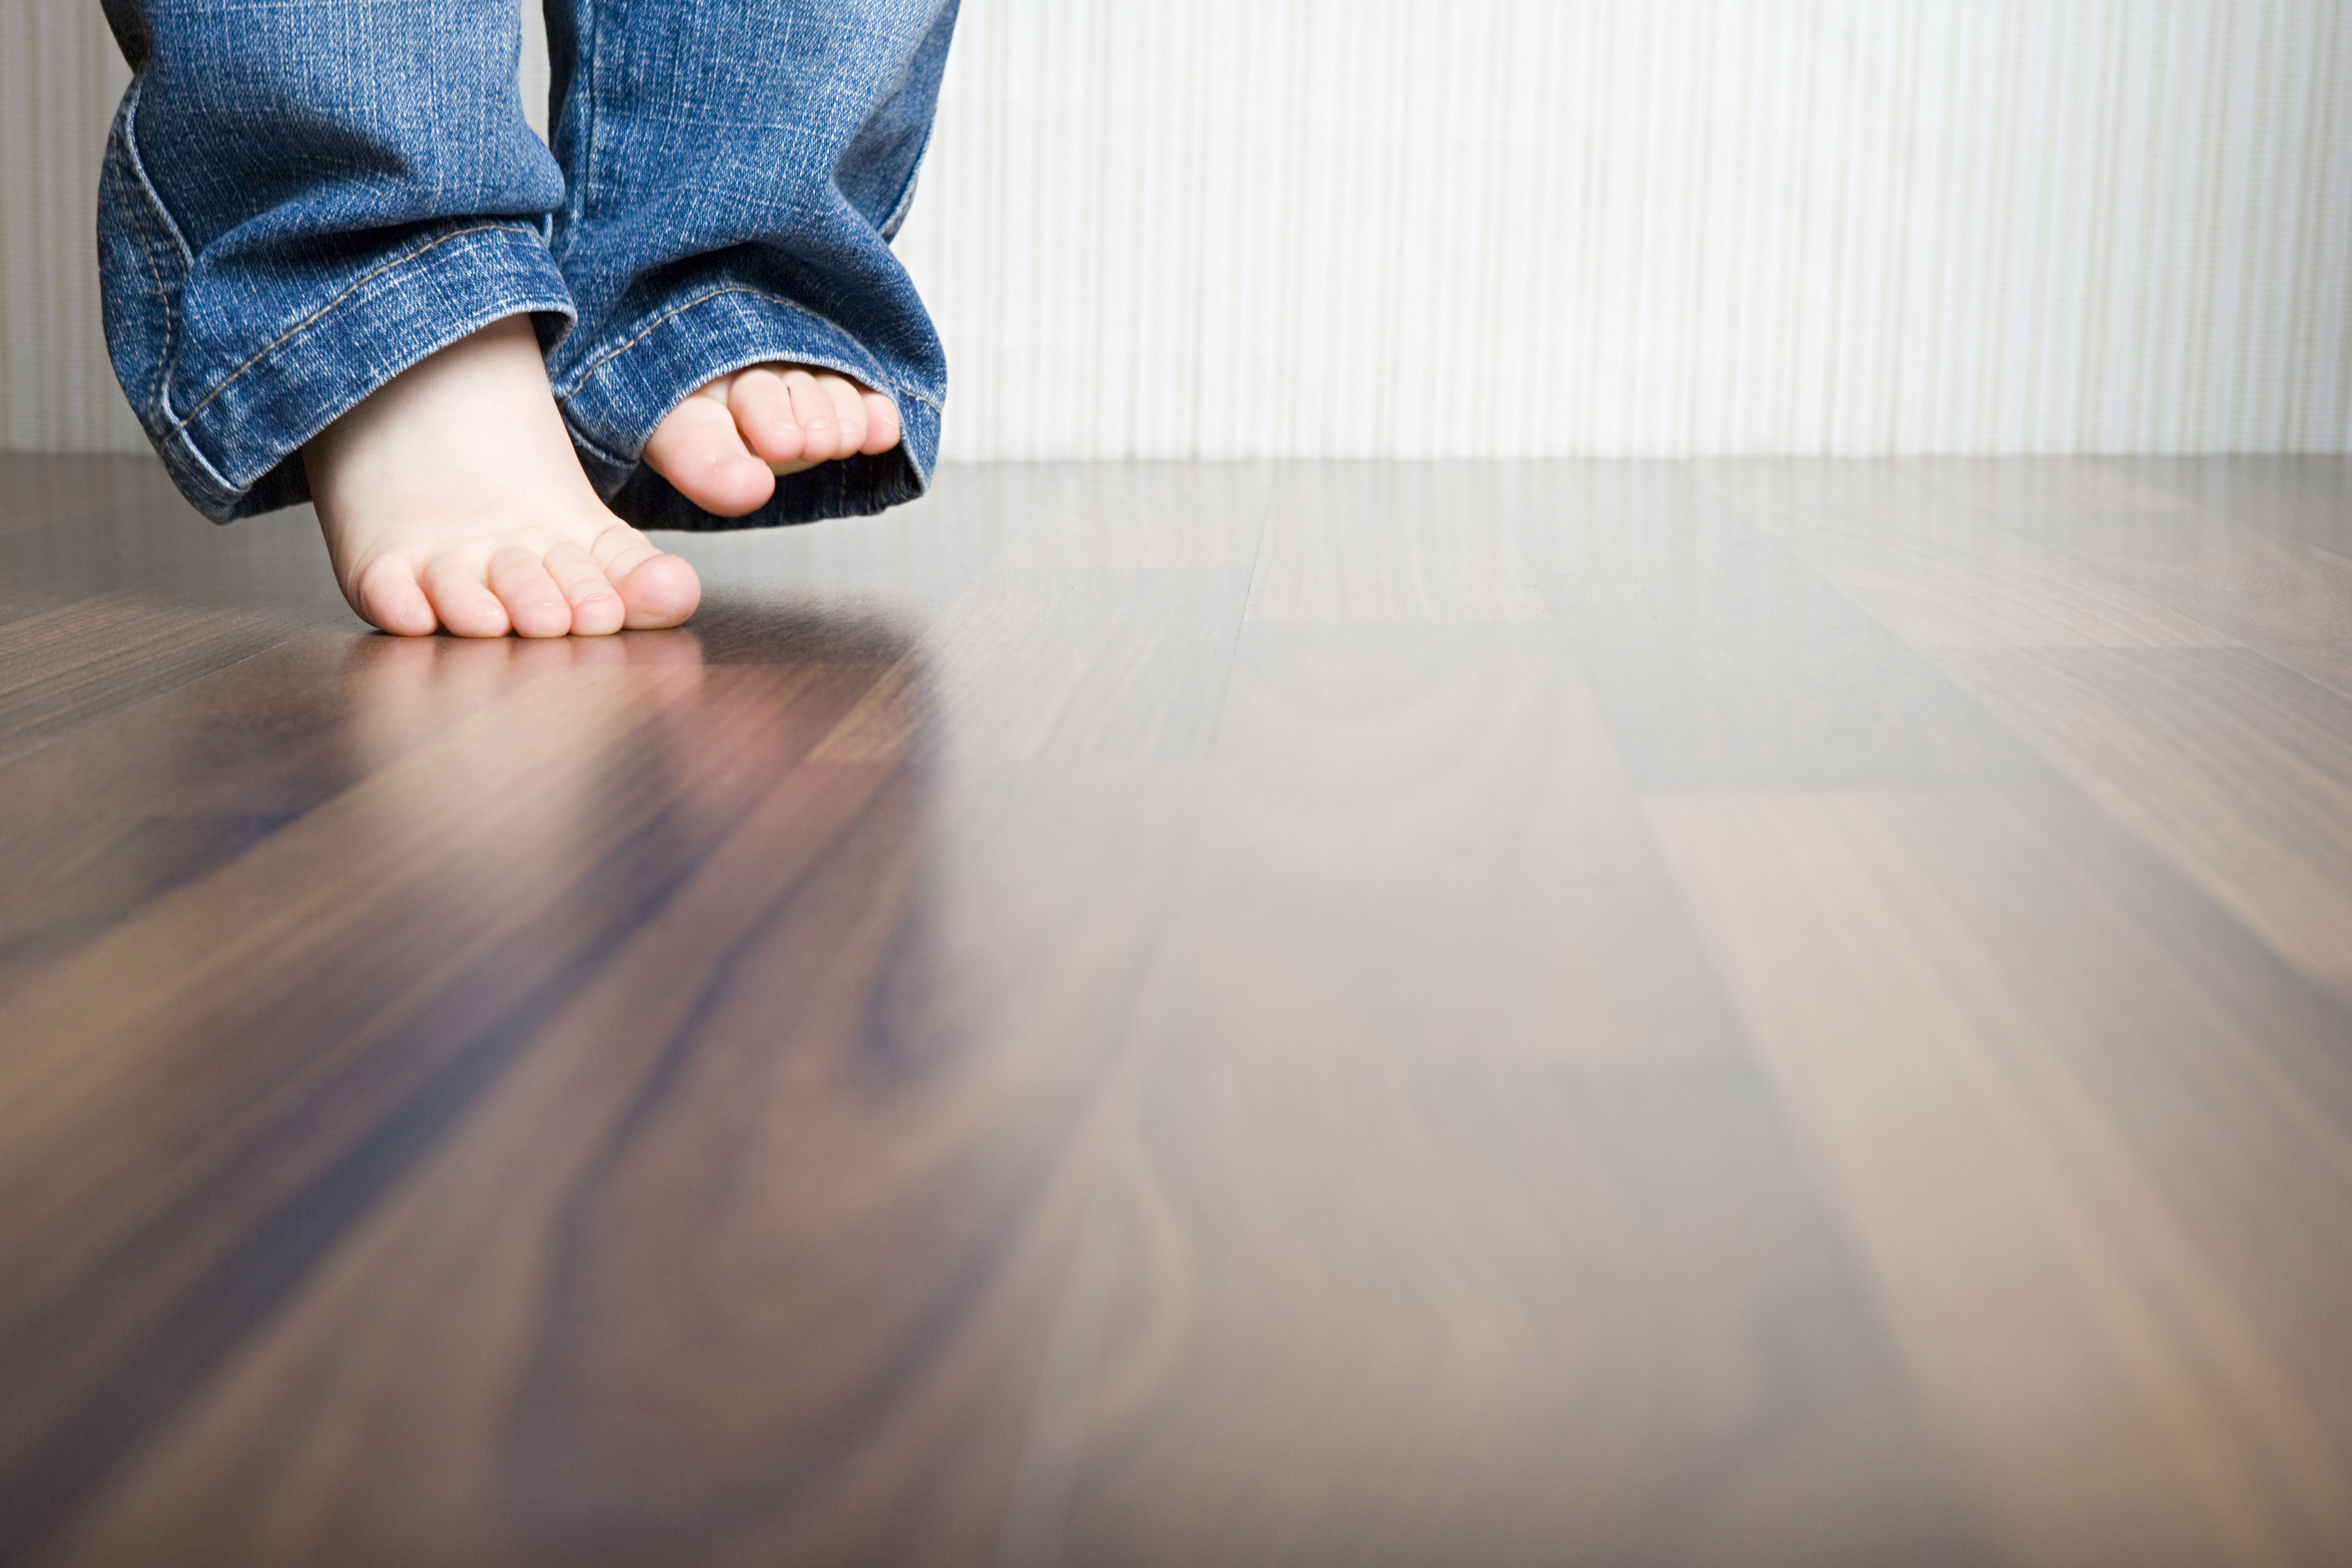 hardwood flooring stairs diy of how to clean hardwood floors best way to clean wood flooring throughout 1512149908 gettyimages 75403973